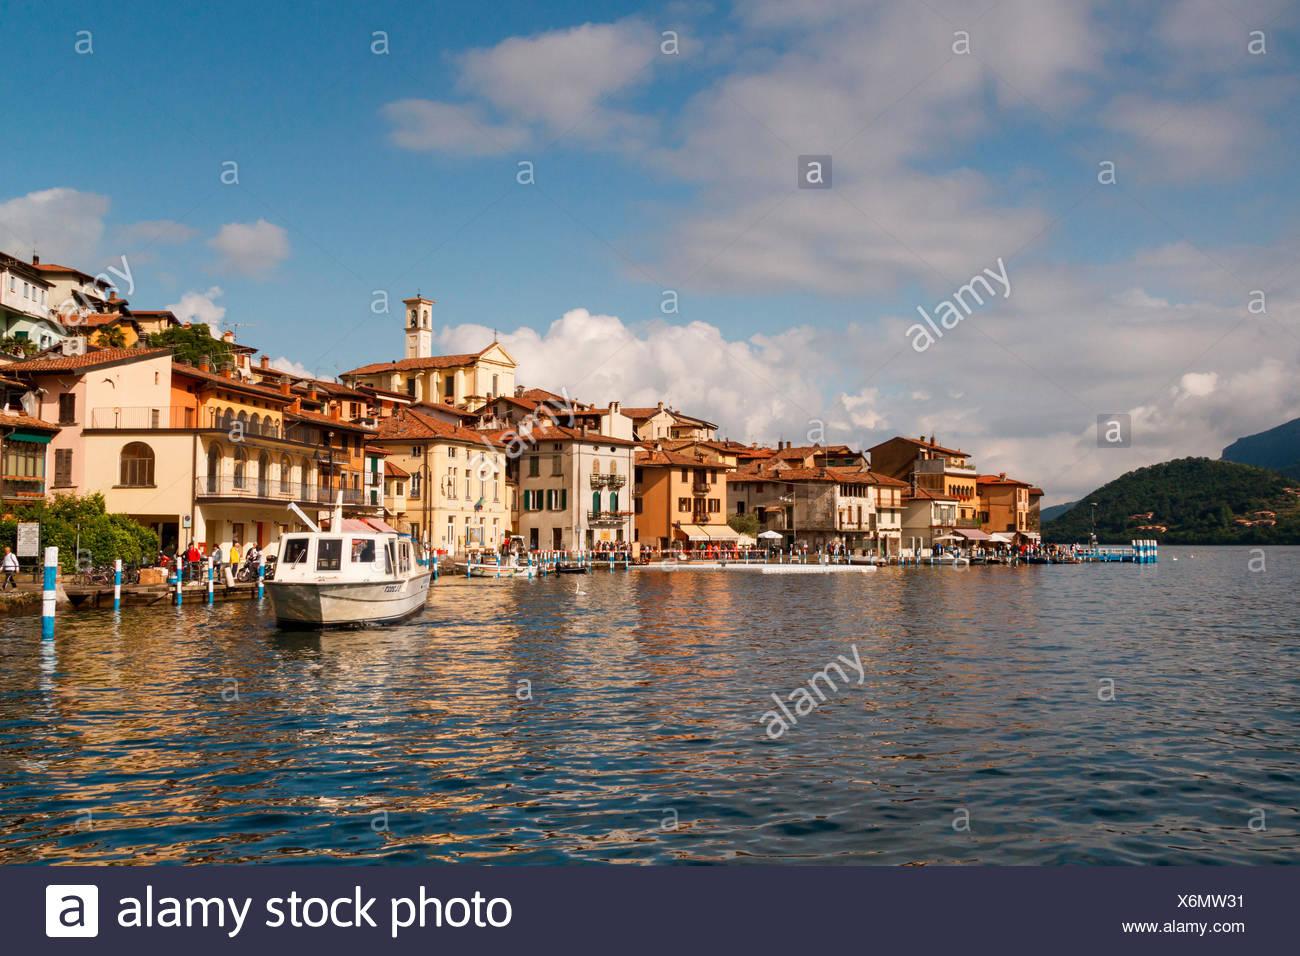 Iseo lake, Lombardy, Italy, Montisola - Stock Image